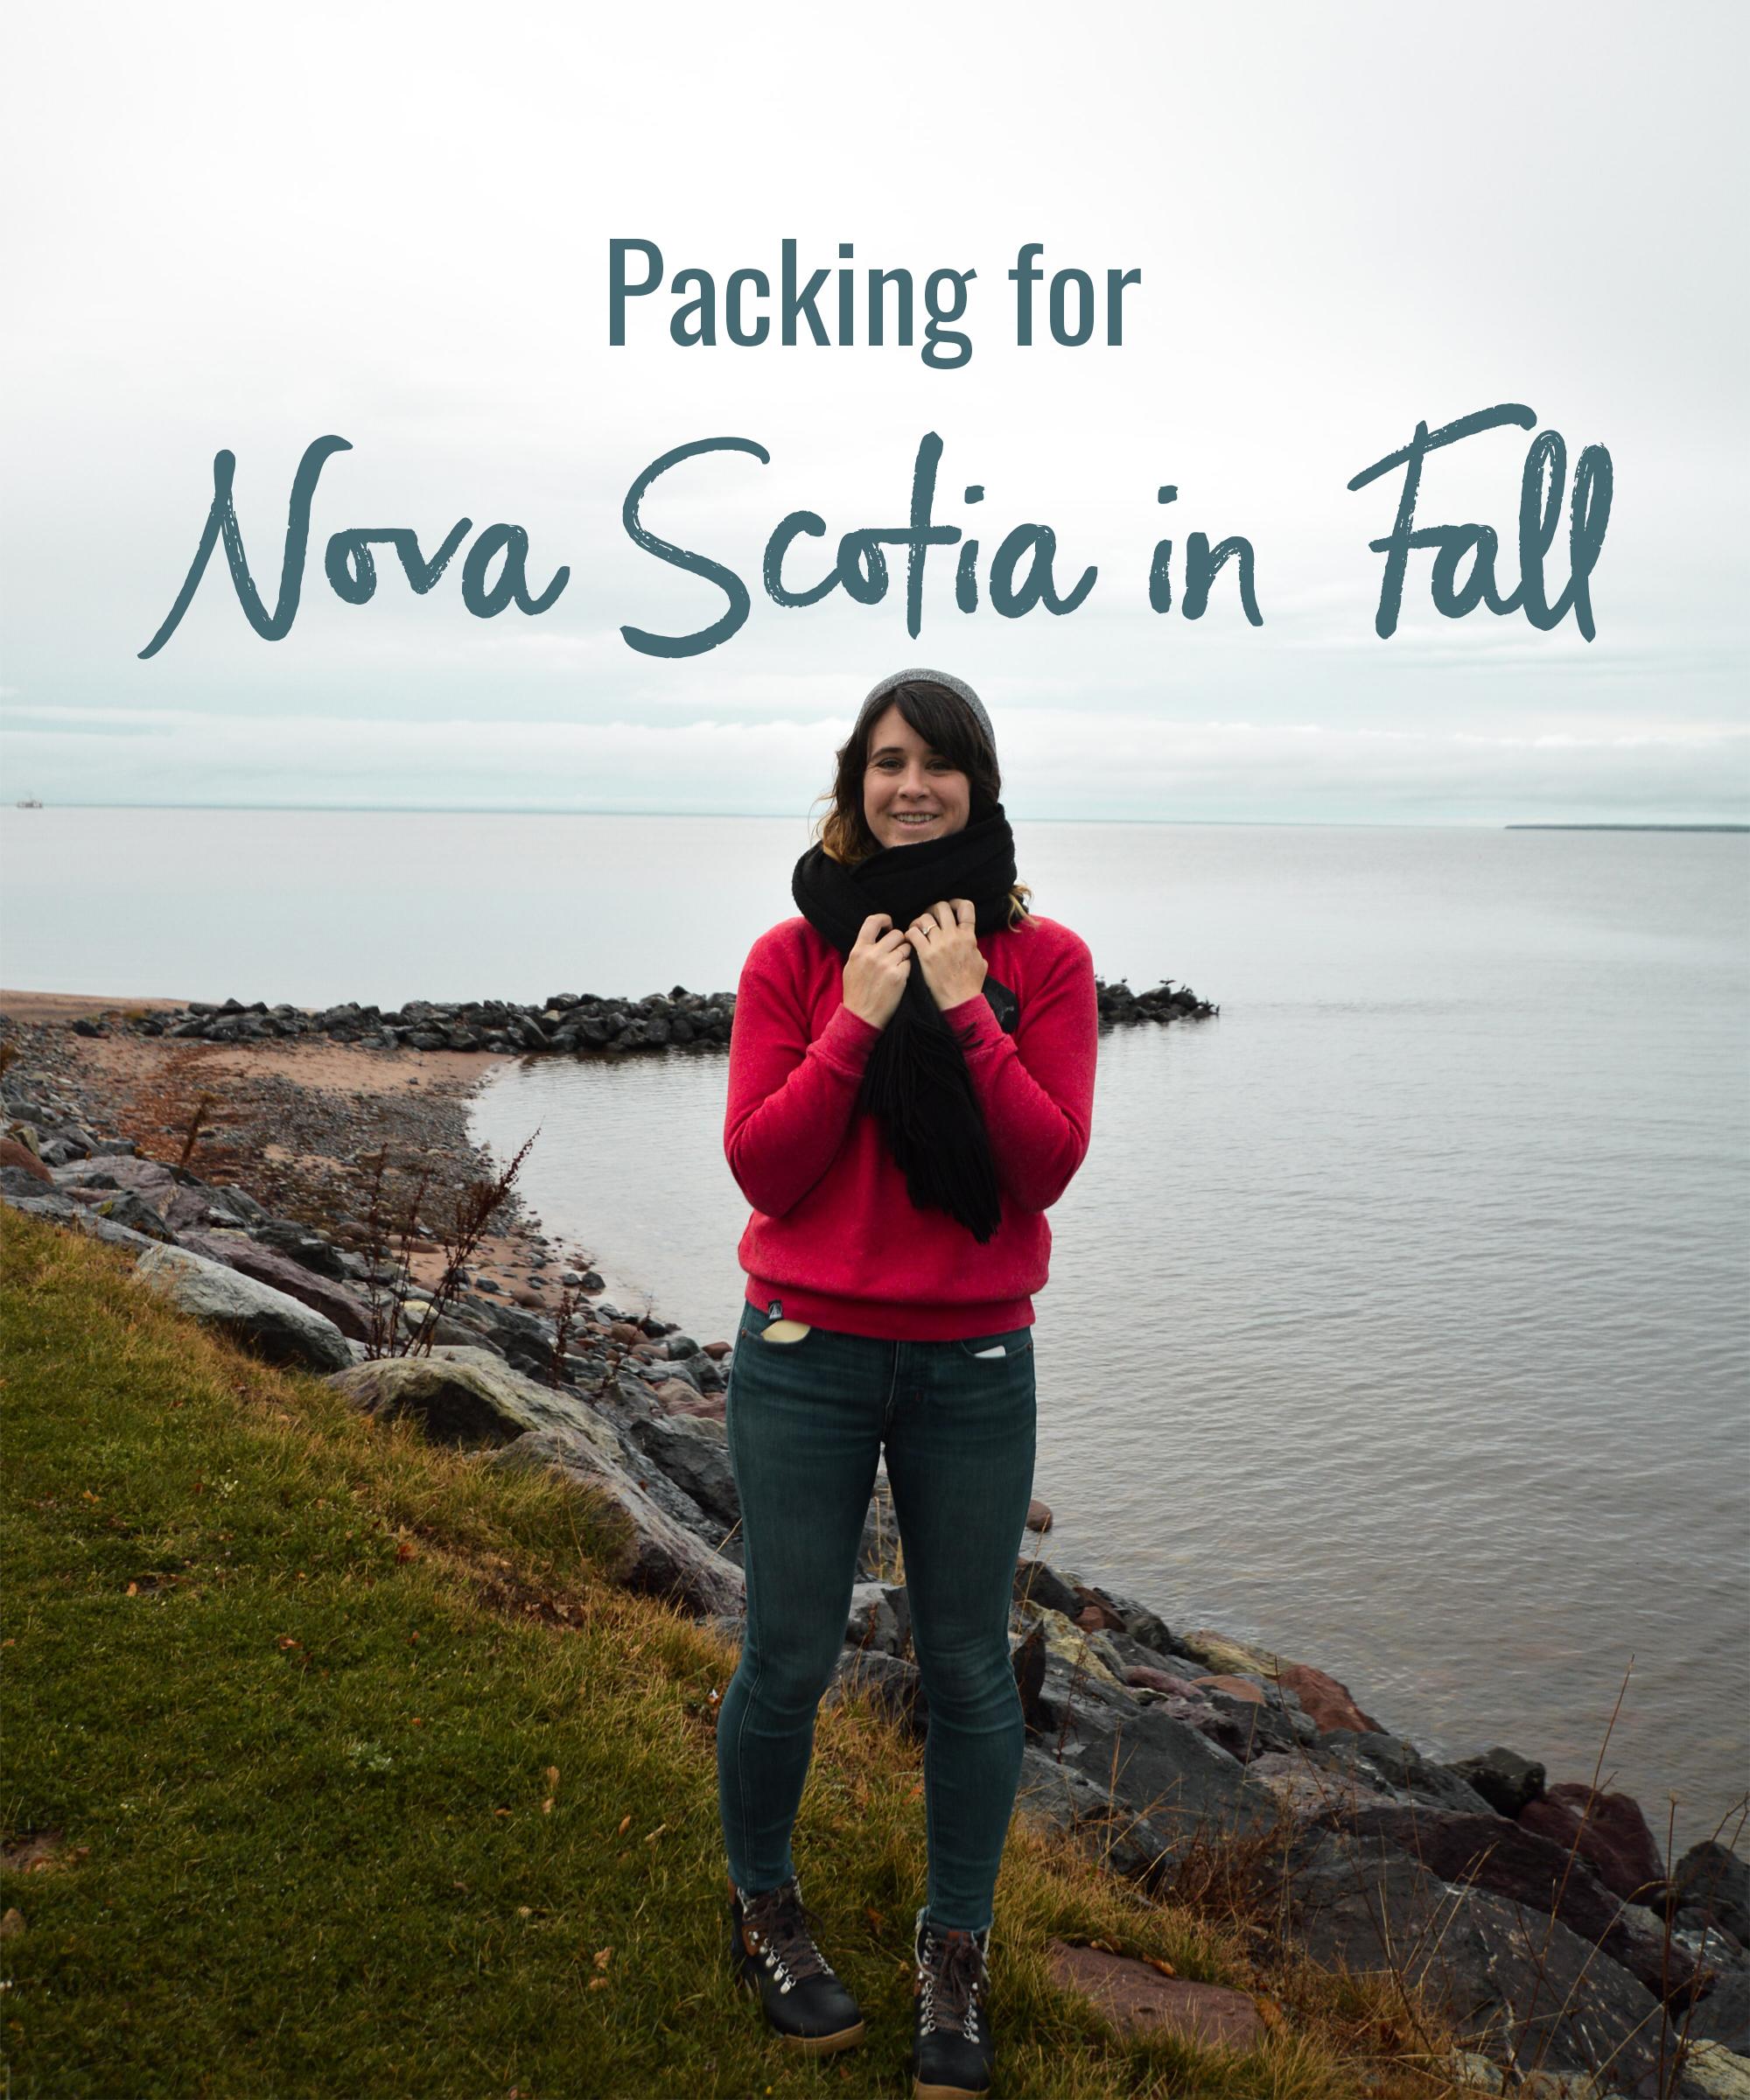 Packing for Nova Scotia in Fall